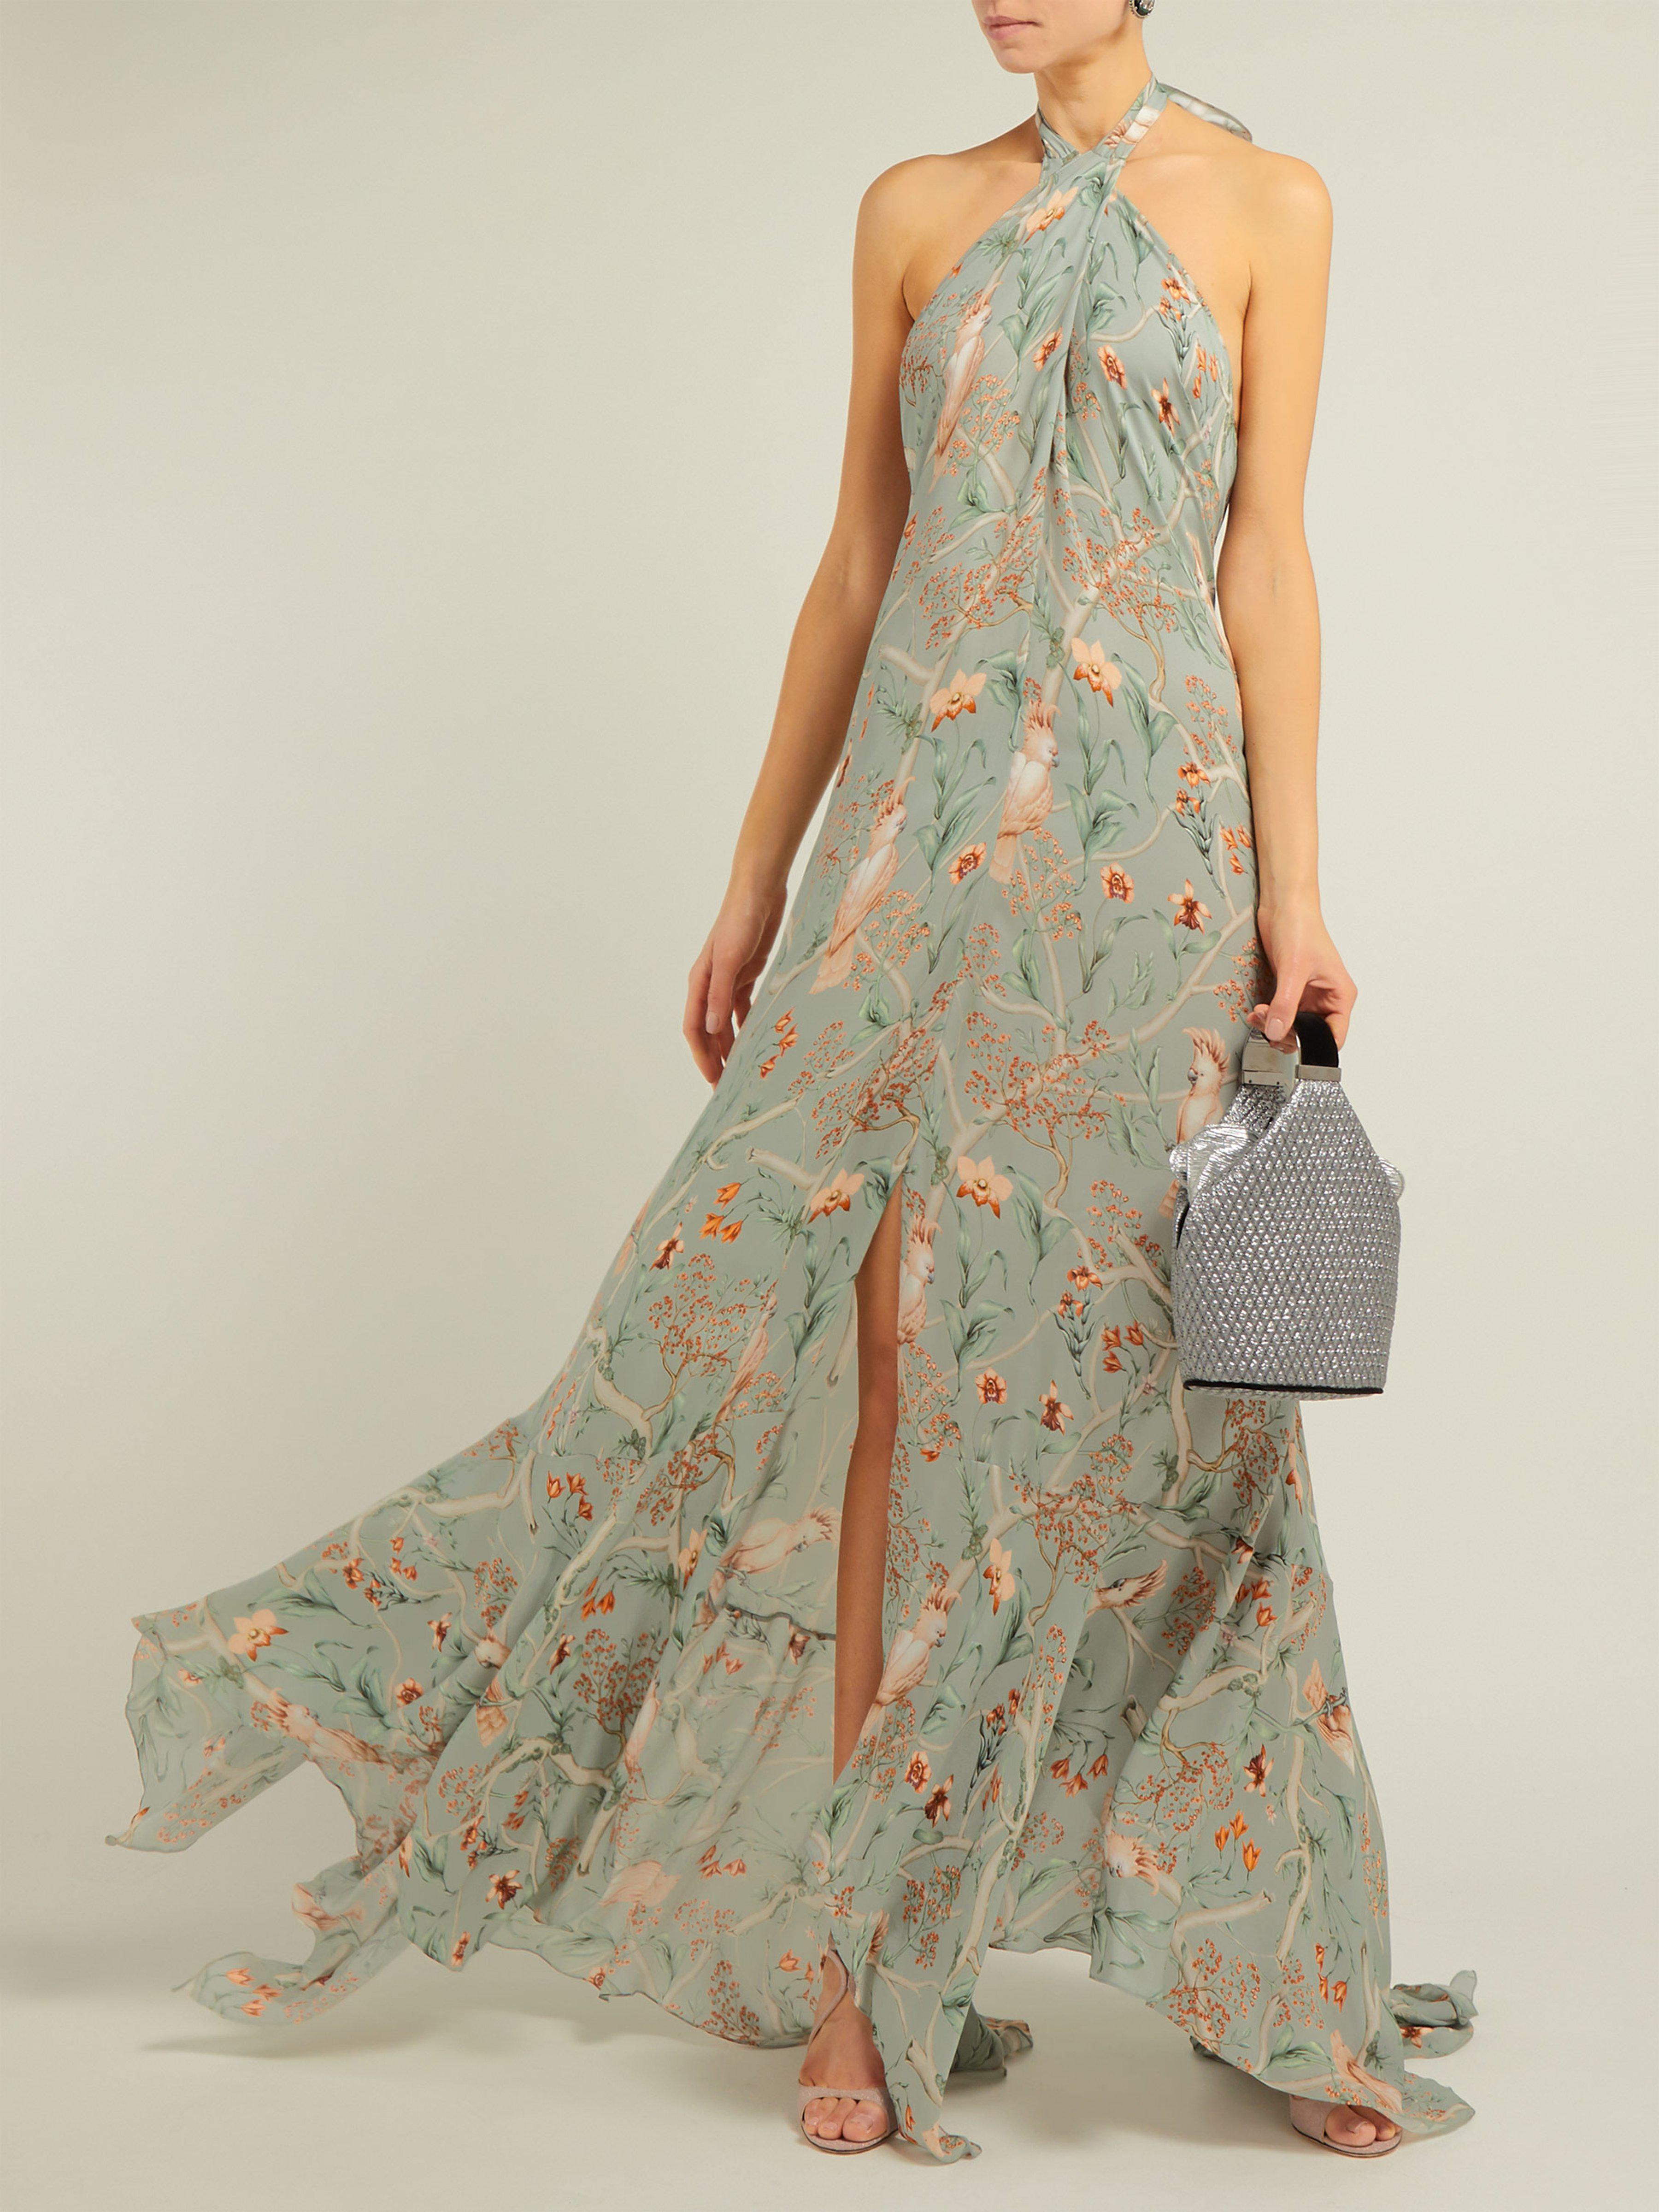 d7c03a0580b Johanna Ortiz Vanuato Floral Print Silk Georgette Gown - Lyst